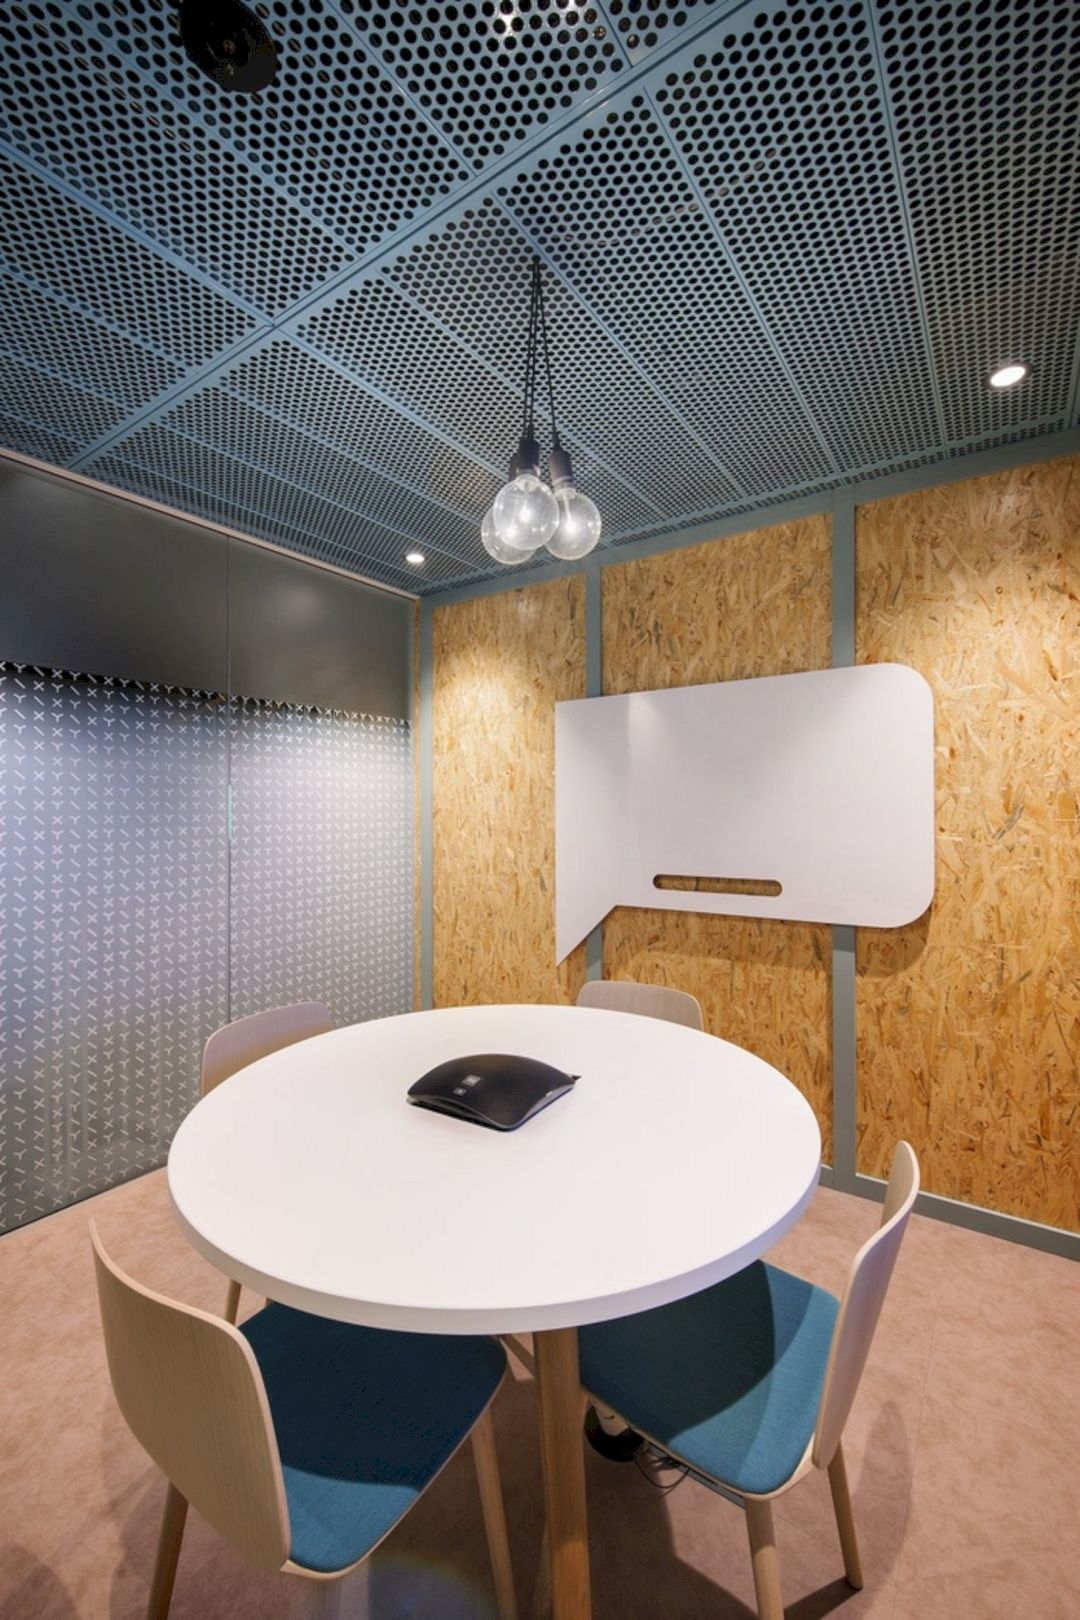 Best Modern And Gorgeous Office Interior Design Ideas  Https://www.futuristarchitecture.com/23070 Office Interior.html